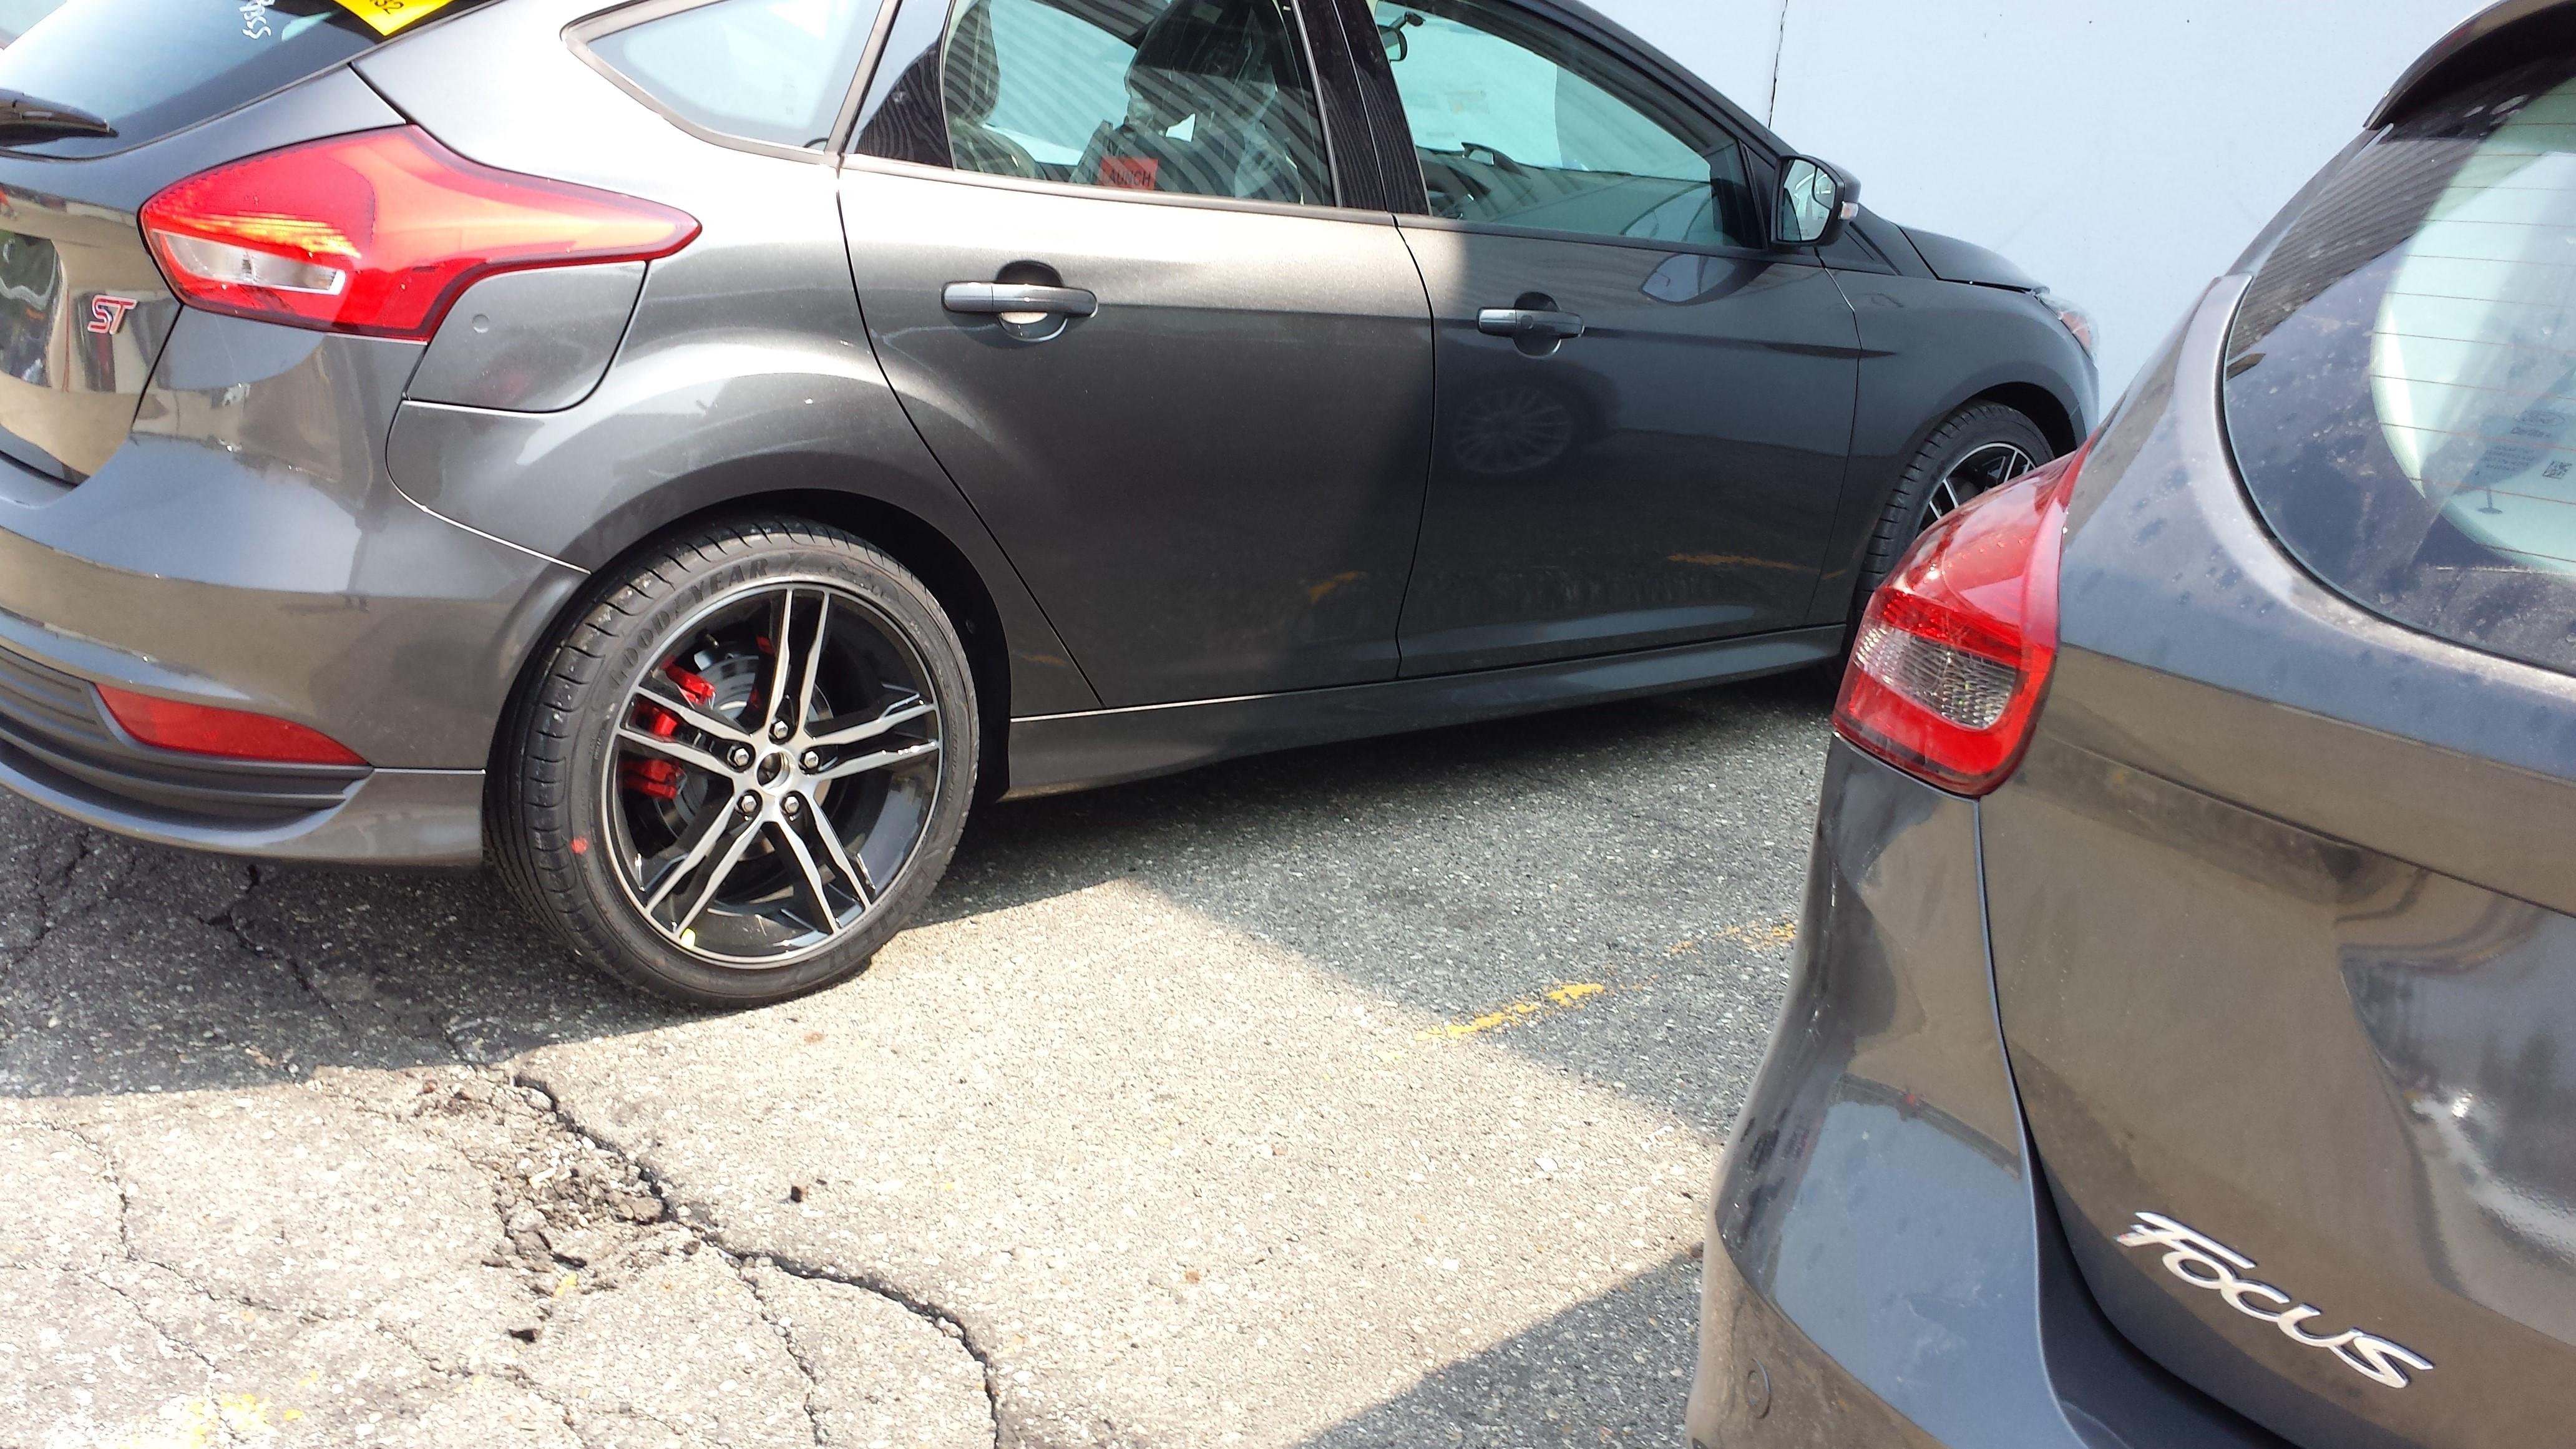 httpwwwfocusstorgforumattachm1 113524jpg - 2015 Ford Focus St Magnetic Metallic